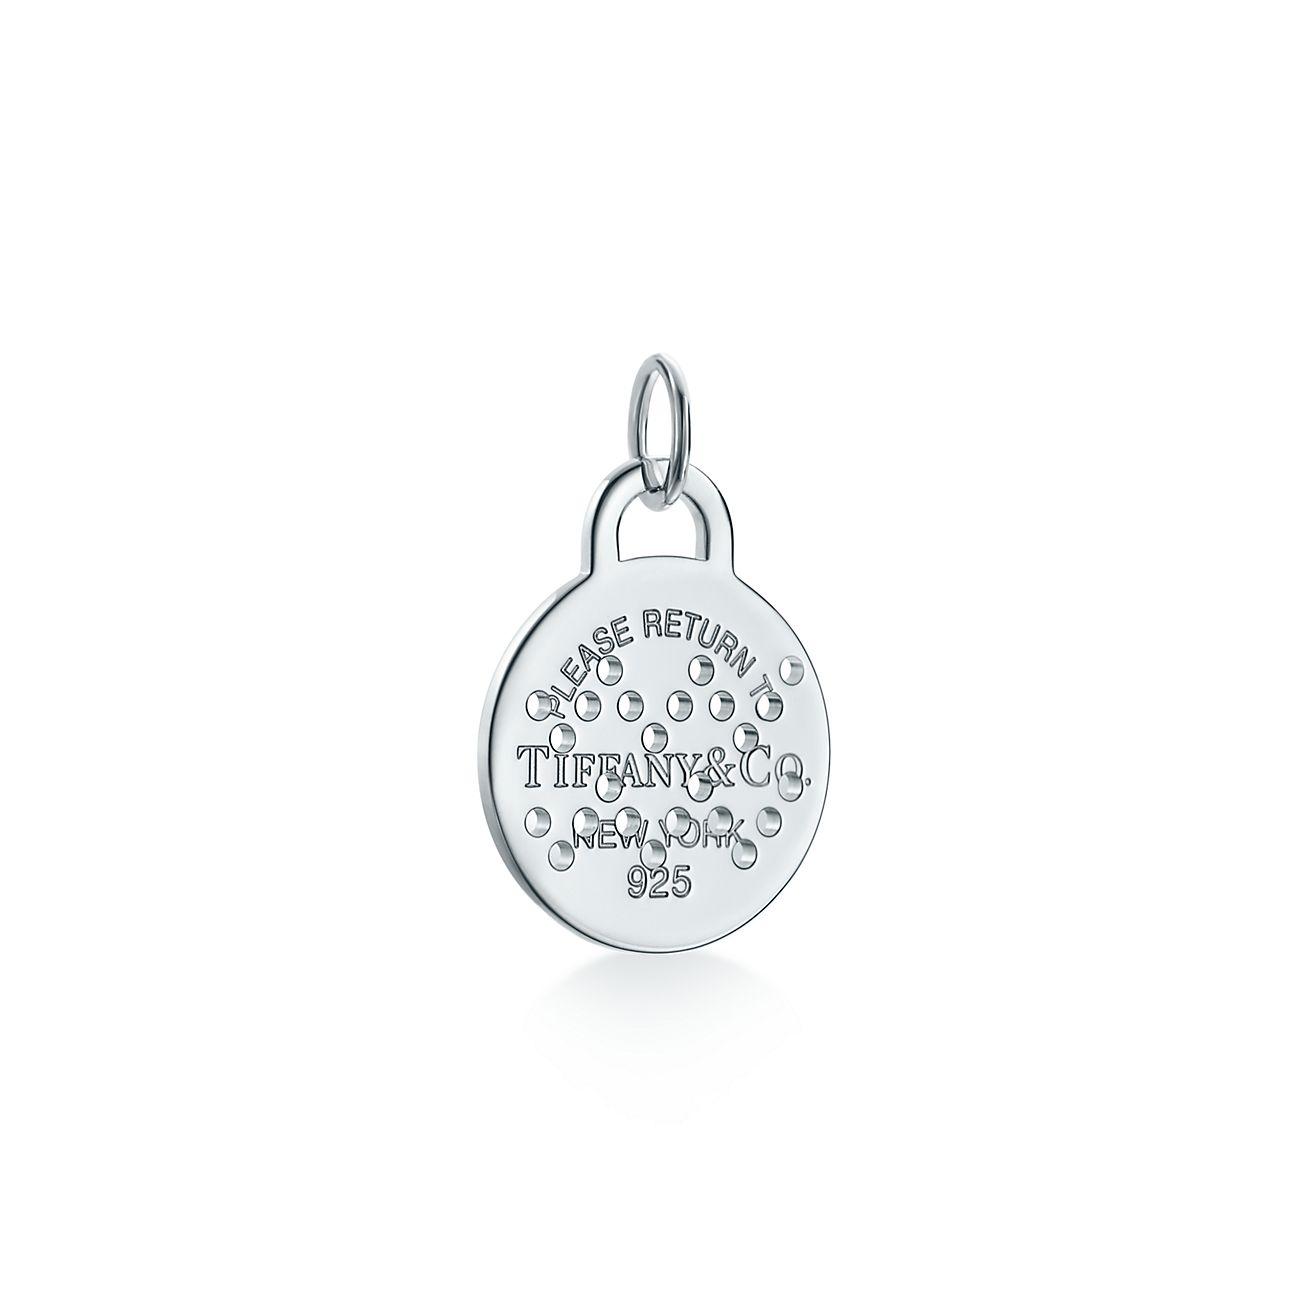 Aquarius zodiac charm in sterling silver - Size Aquarius Tiffany & Co. AbEuaWe